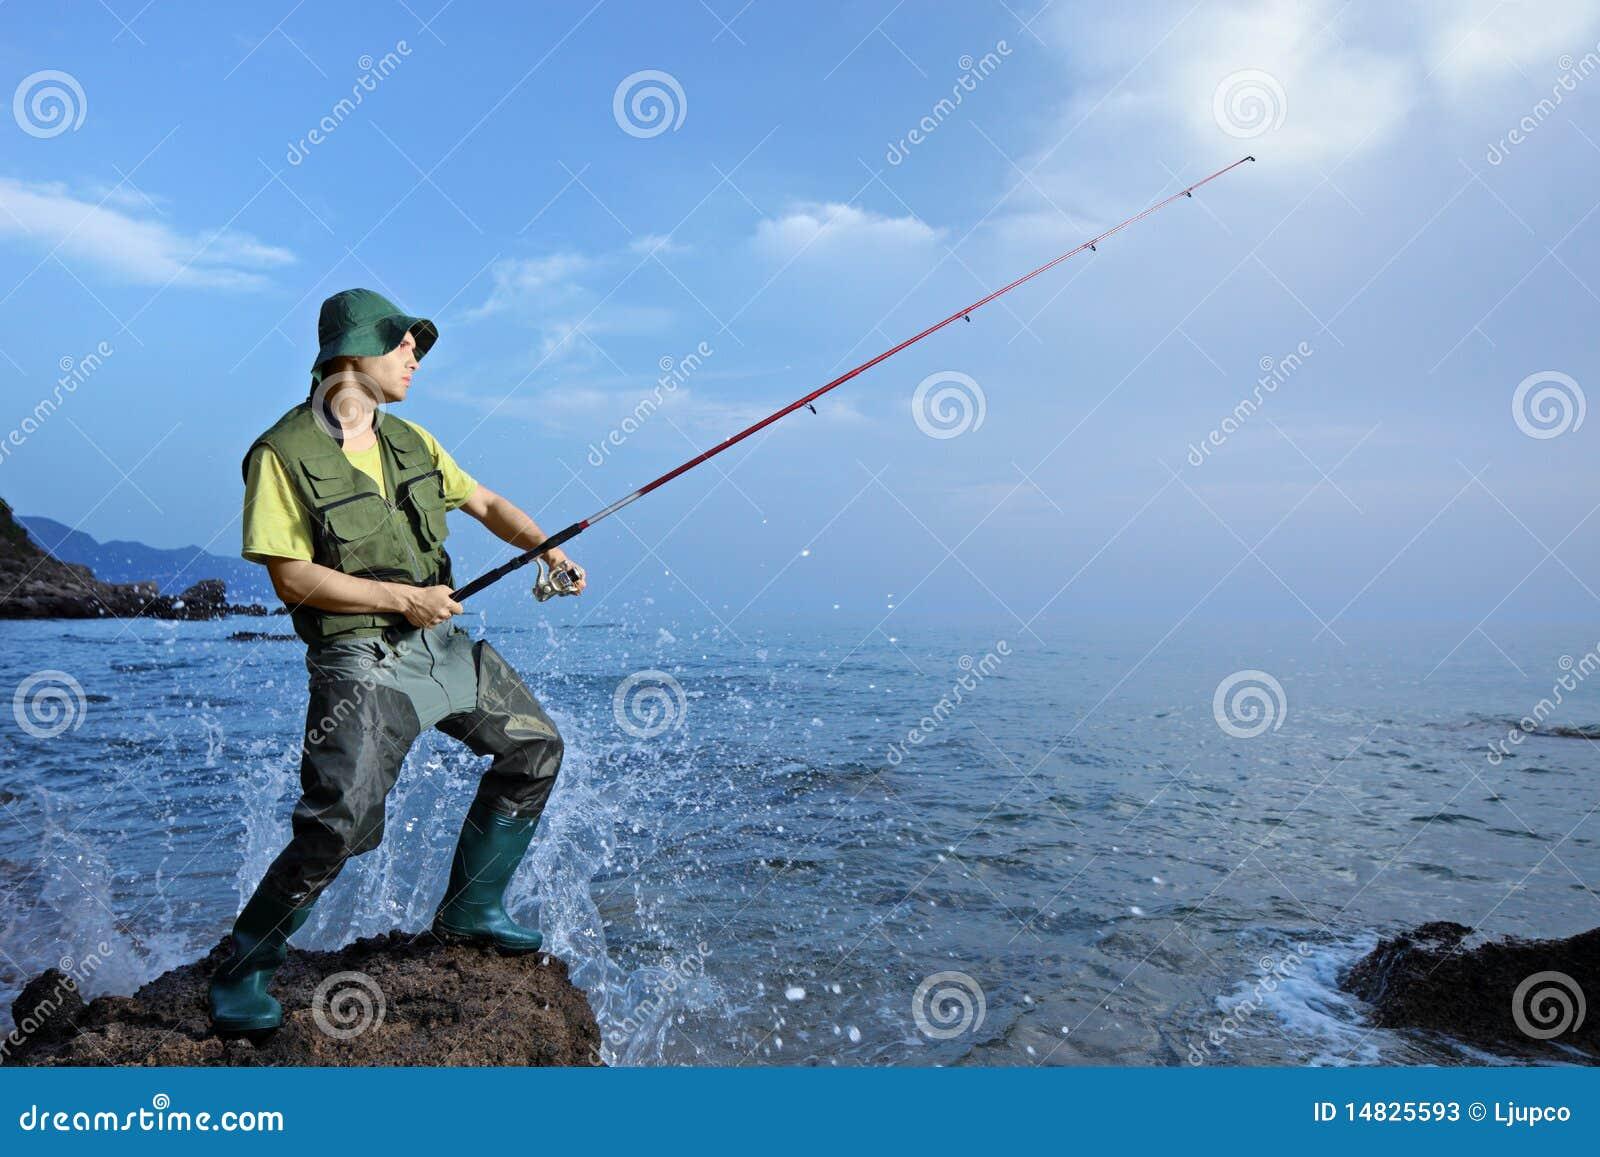 A Fisherman Fishing At The Sea Stock Image Image Of